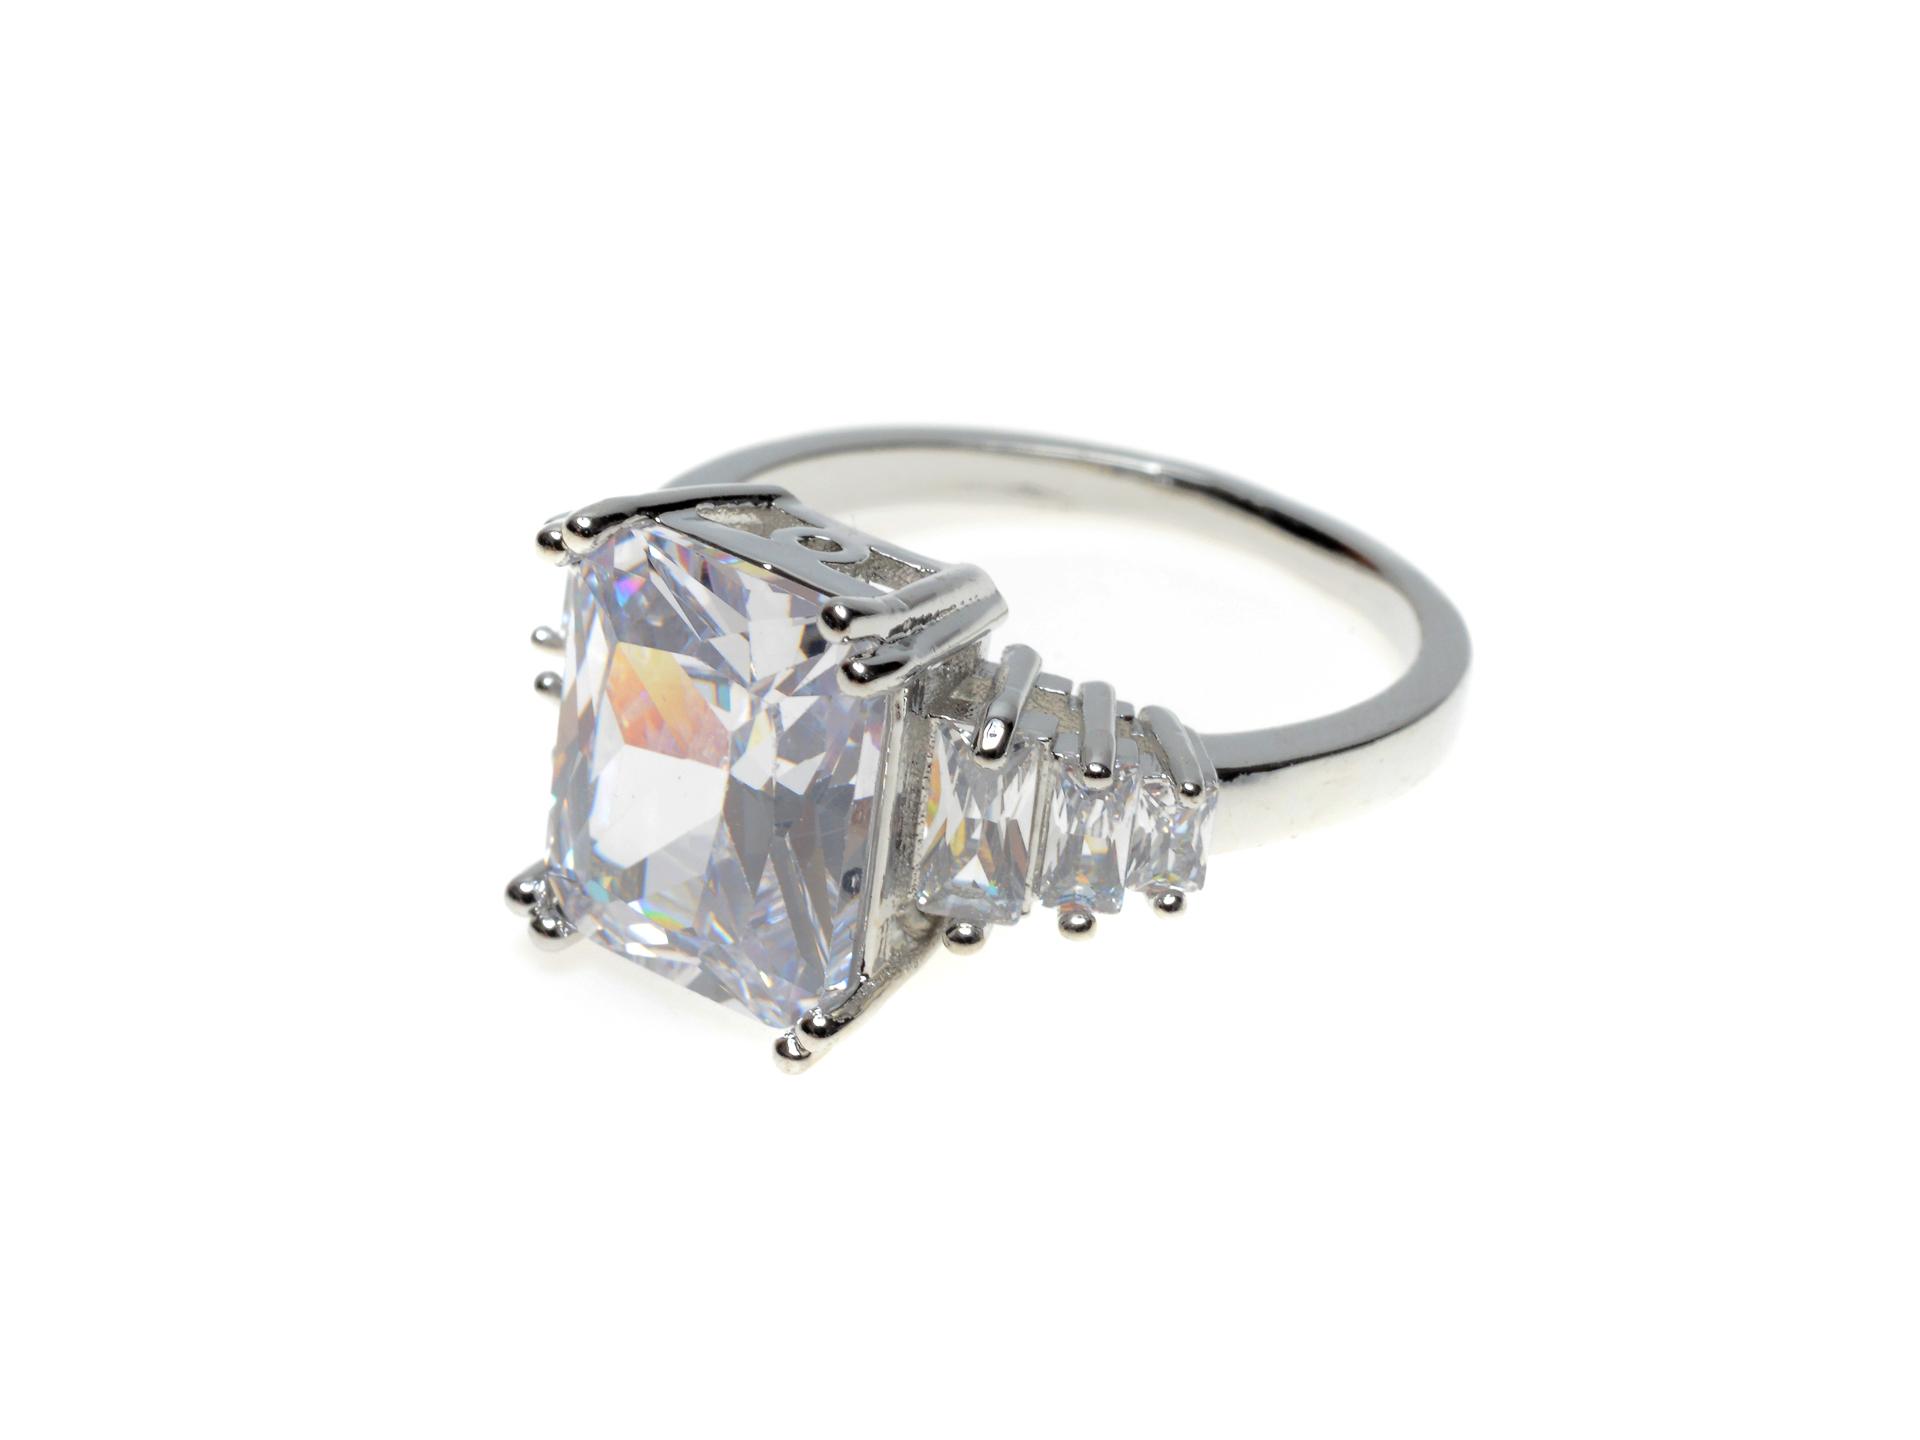 Inel ALDO argintiu, Hira973, din metal